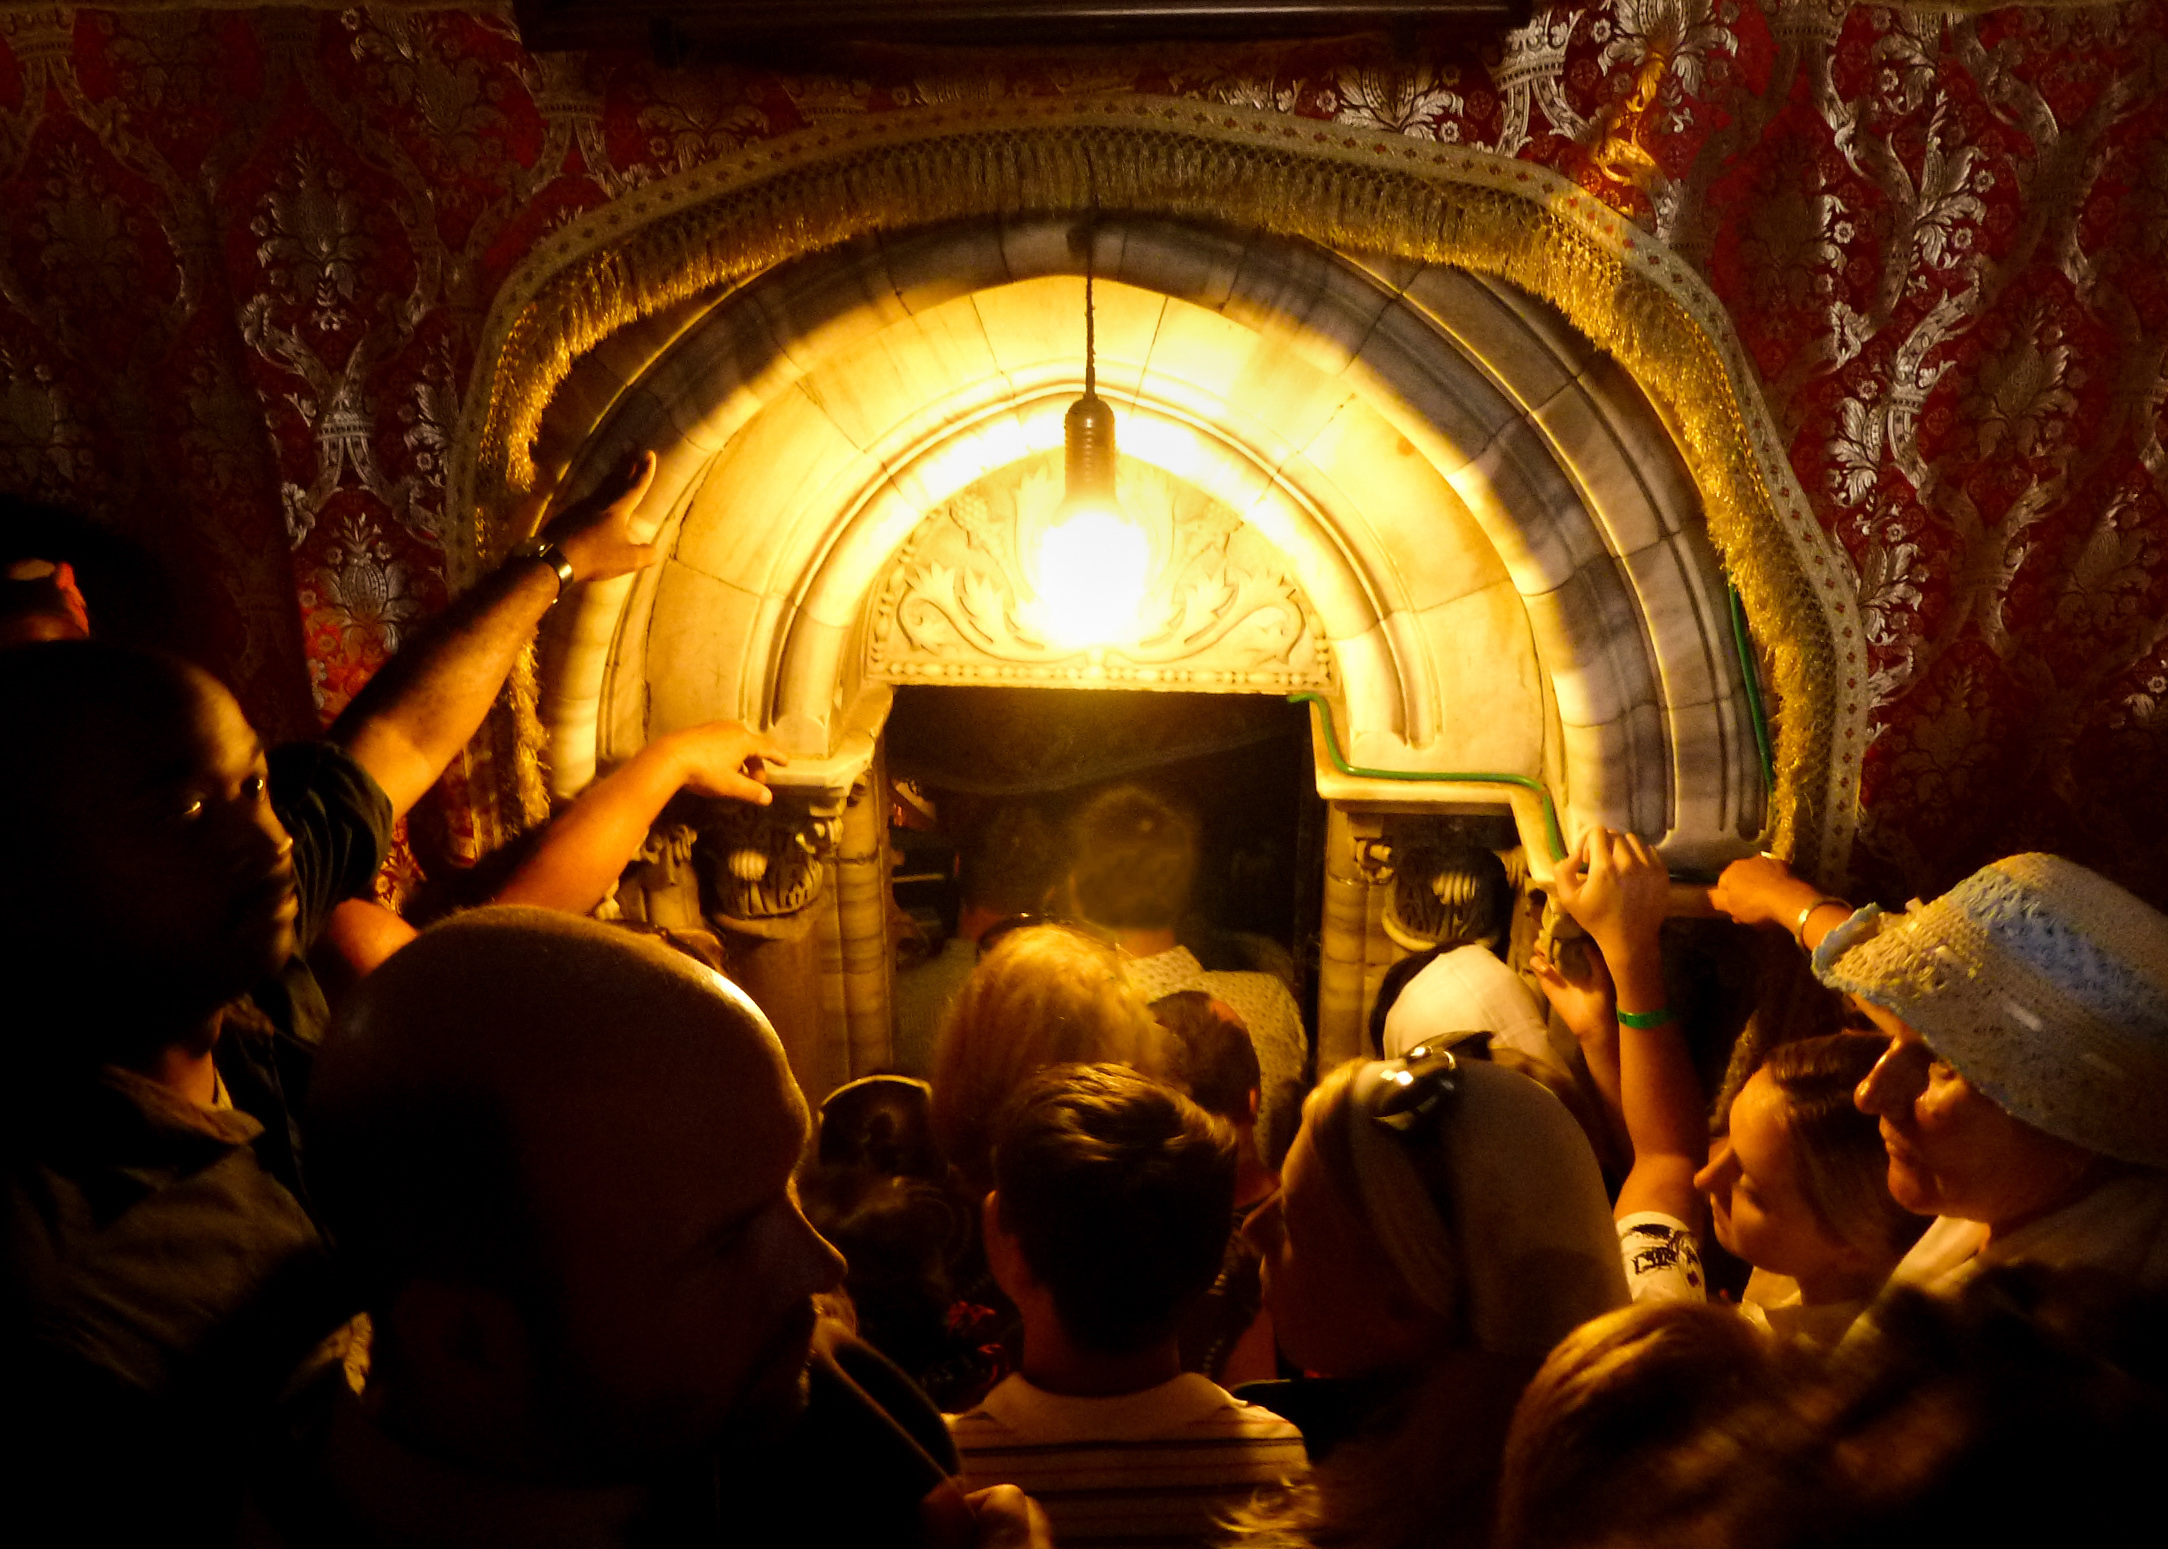 The Church of the Nativity, Bethlehem, Palestine (Katie Archibald-Woodward)